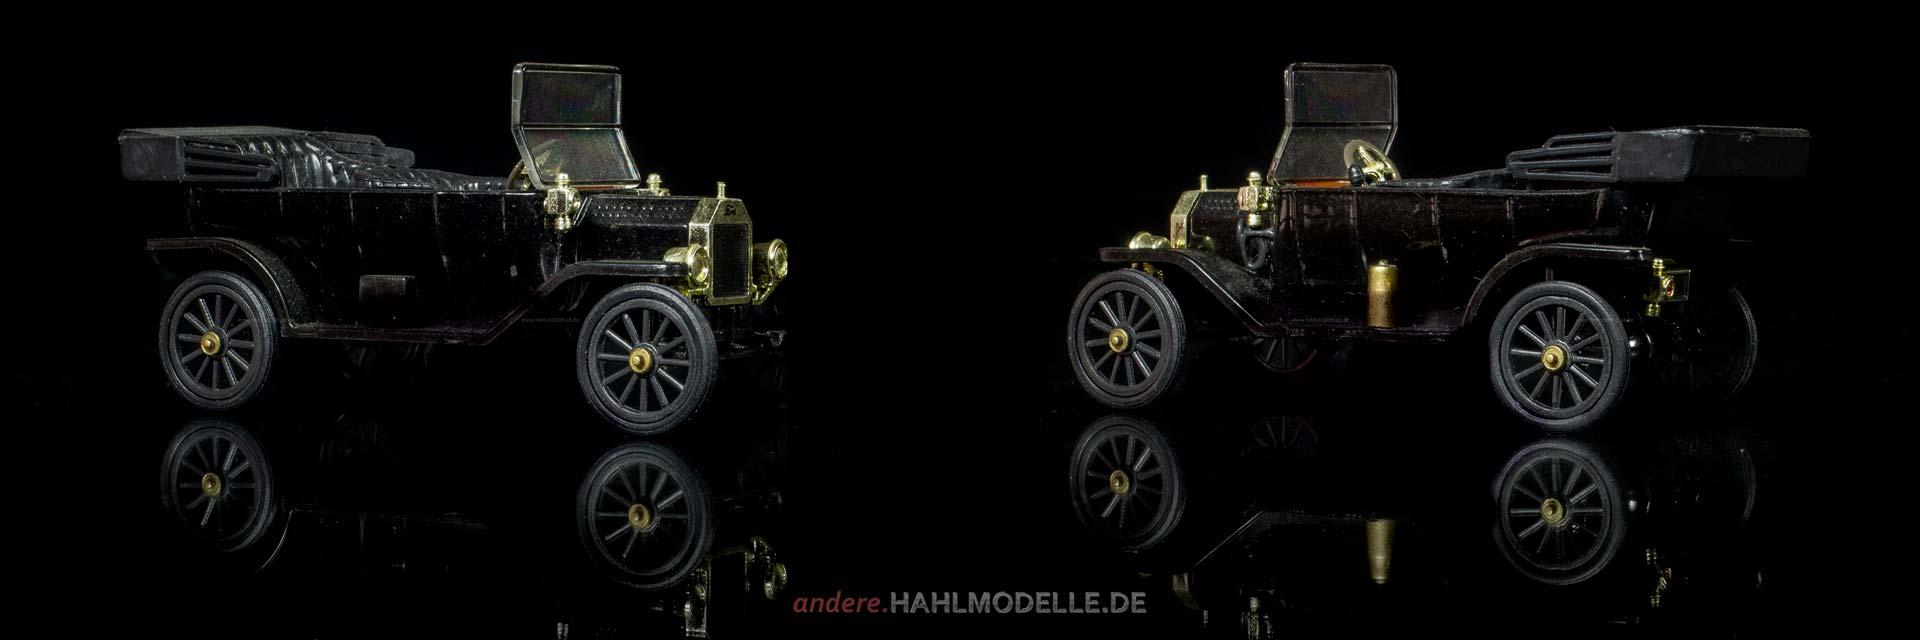 Ford Model T | Limousine | Ixo | 1:43 | www.andere.hahlmodelle.de